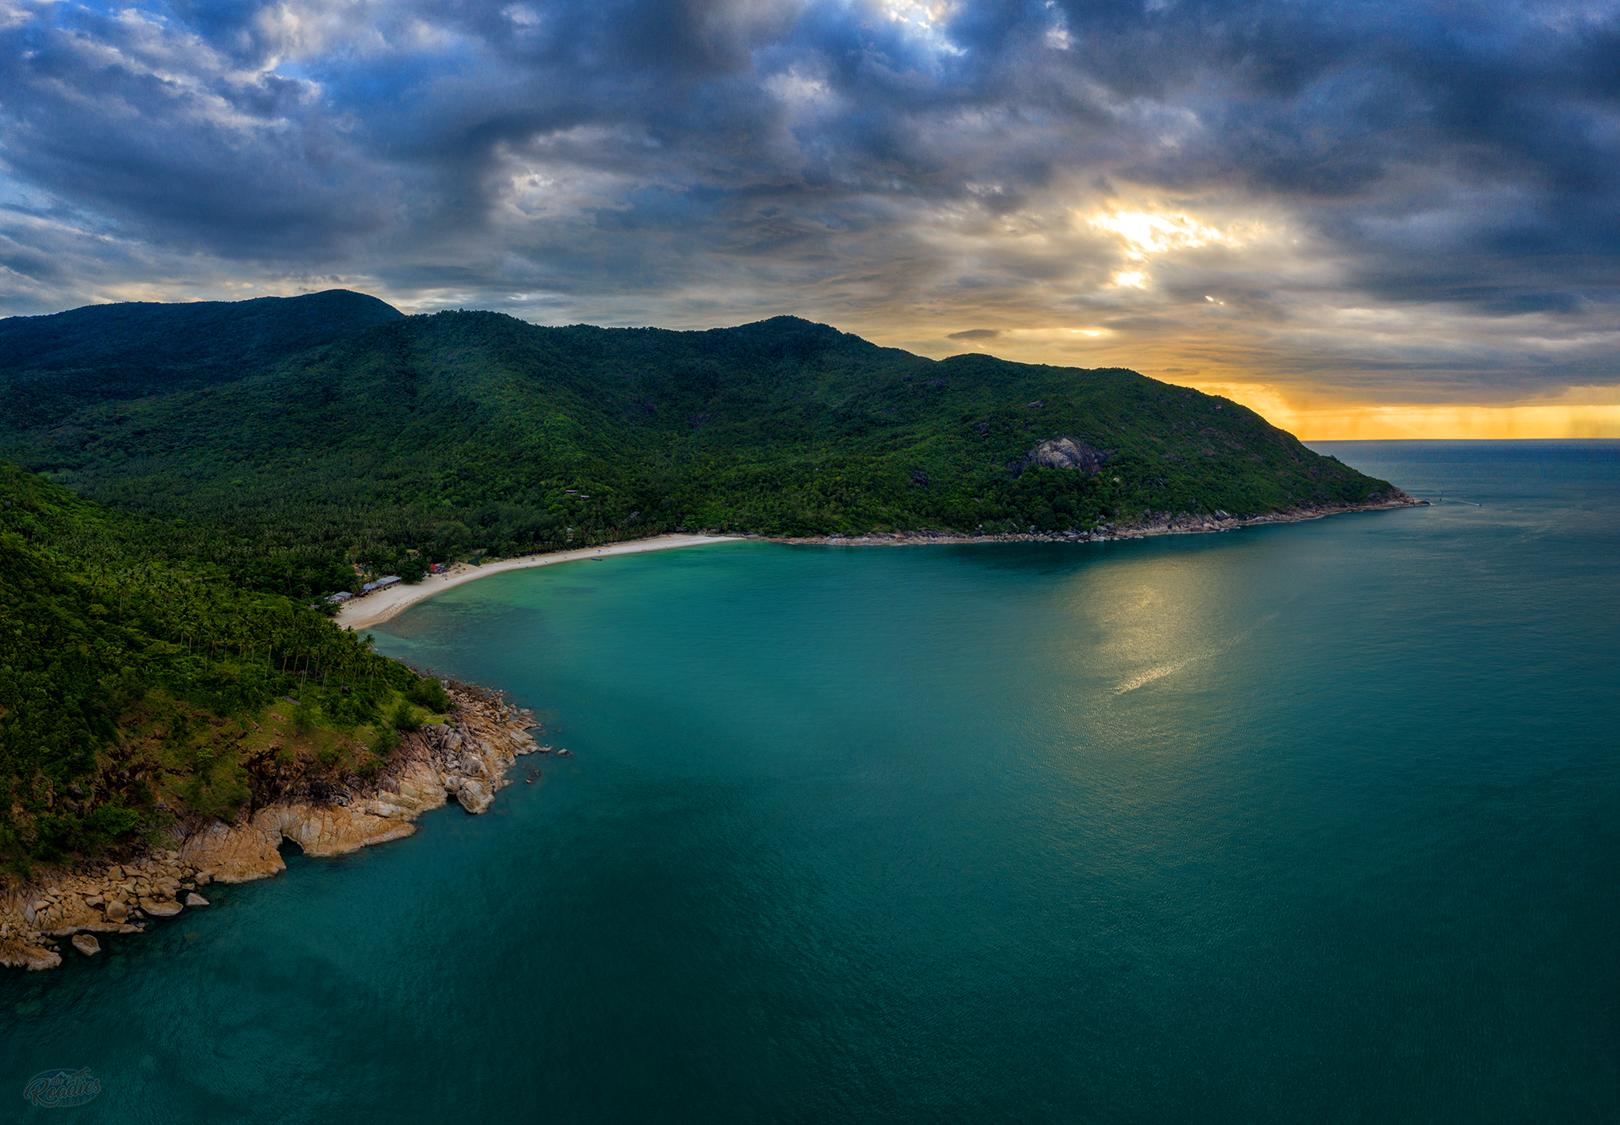 Fotorucksack_Thailand_Kamerarucksack_Vanguard